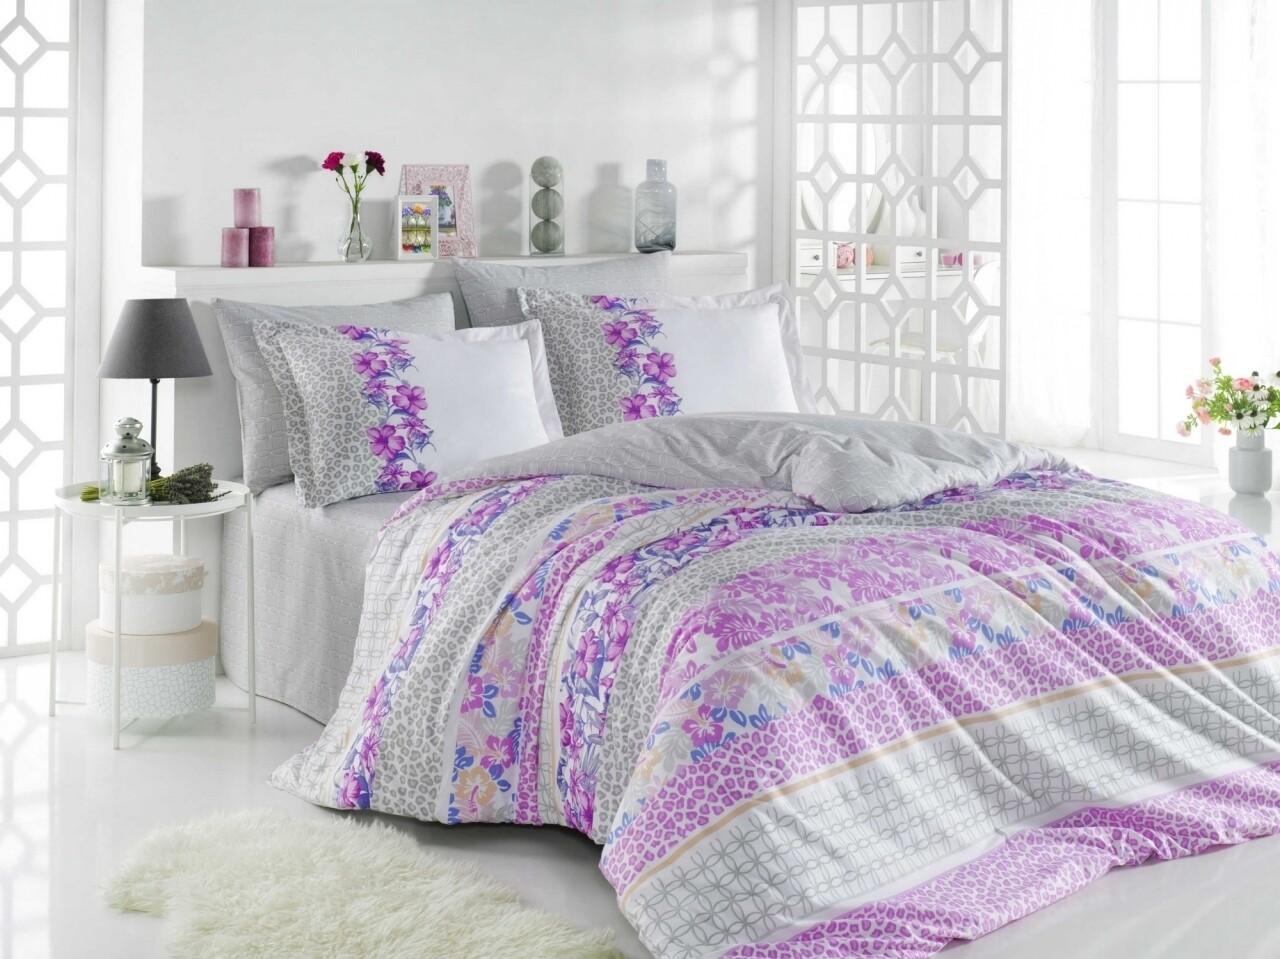 Lenjerie de pat pentru o persoana, 3 piese, 100% bumbac poplin, Hobby, Scarlet, roz/gri